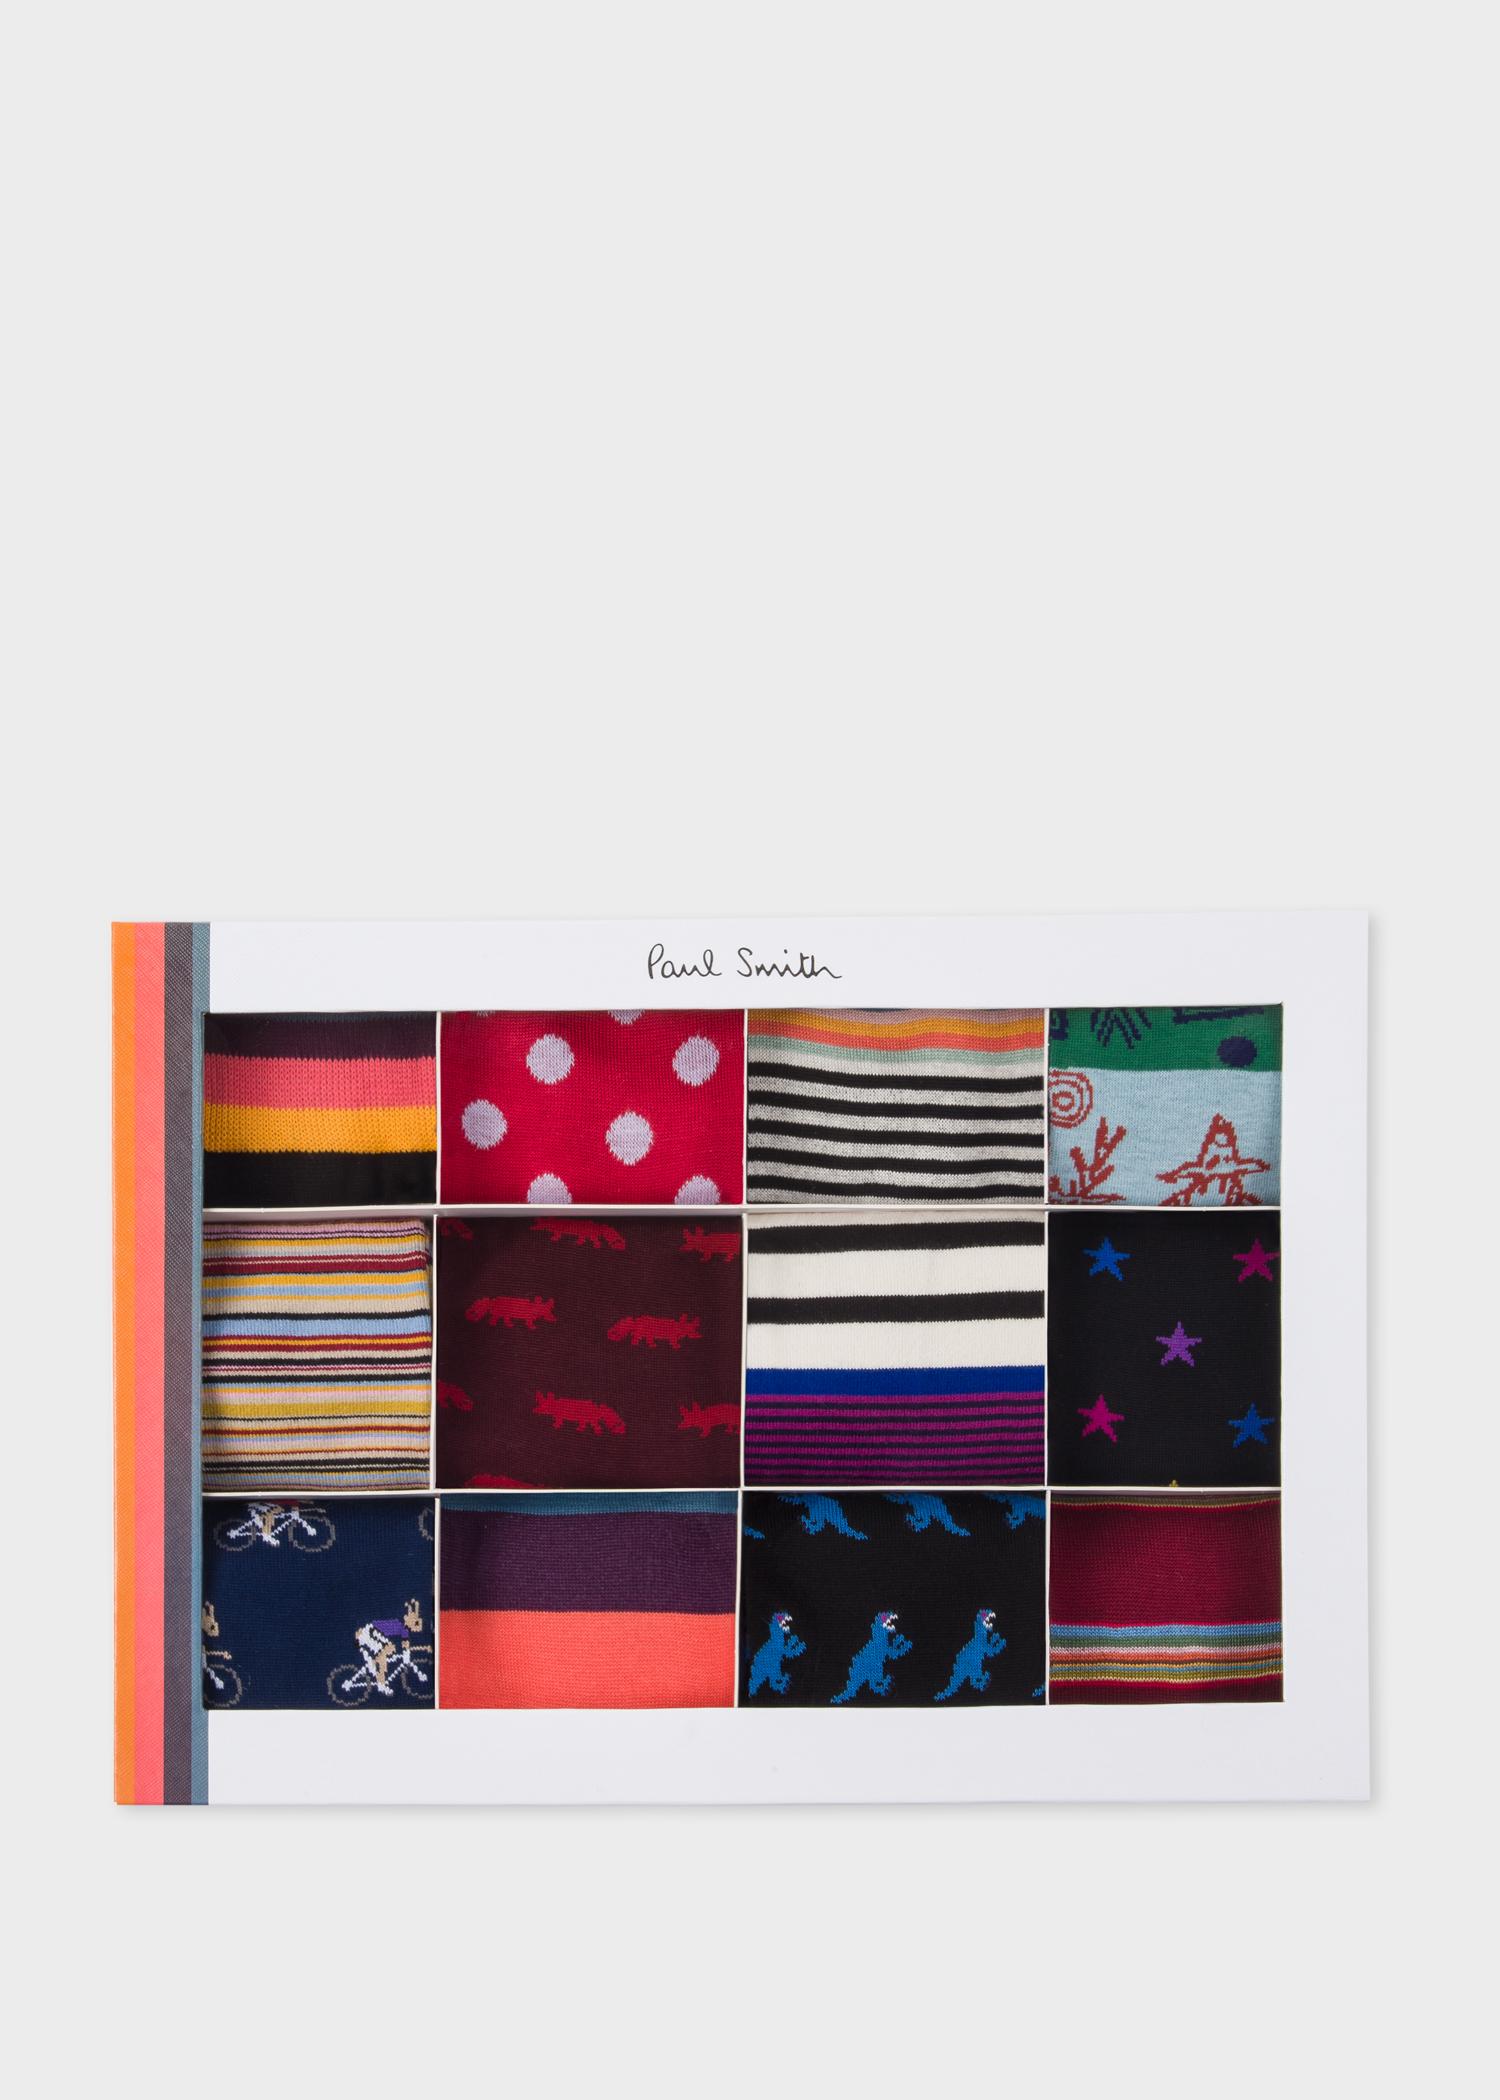 Box View - Paul Smith Men's Socks Gift Box 2019 Edition